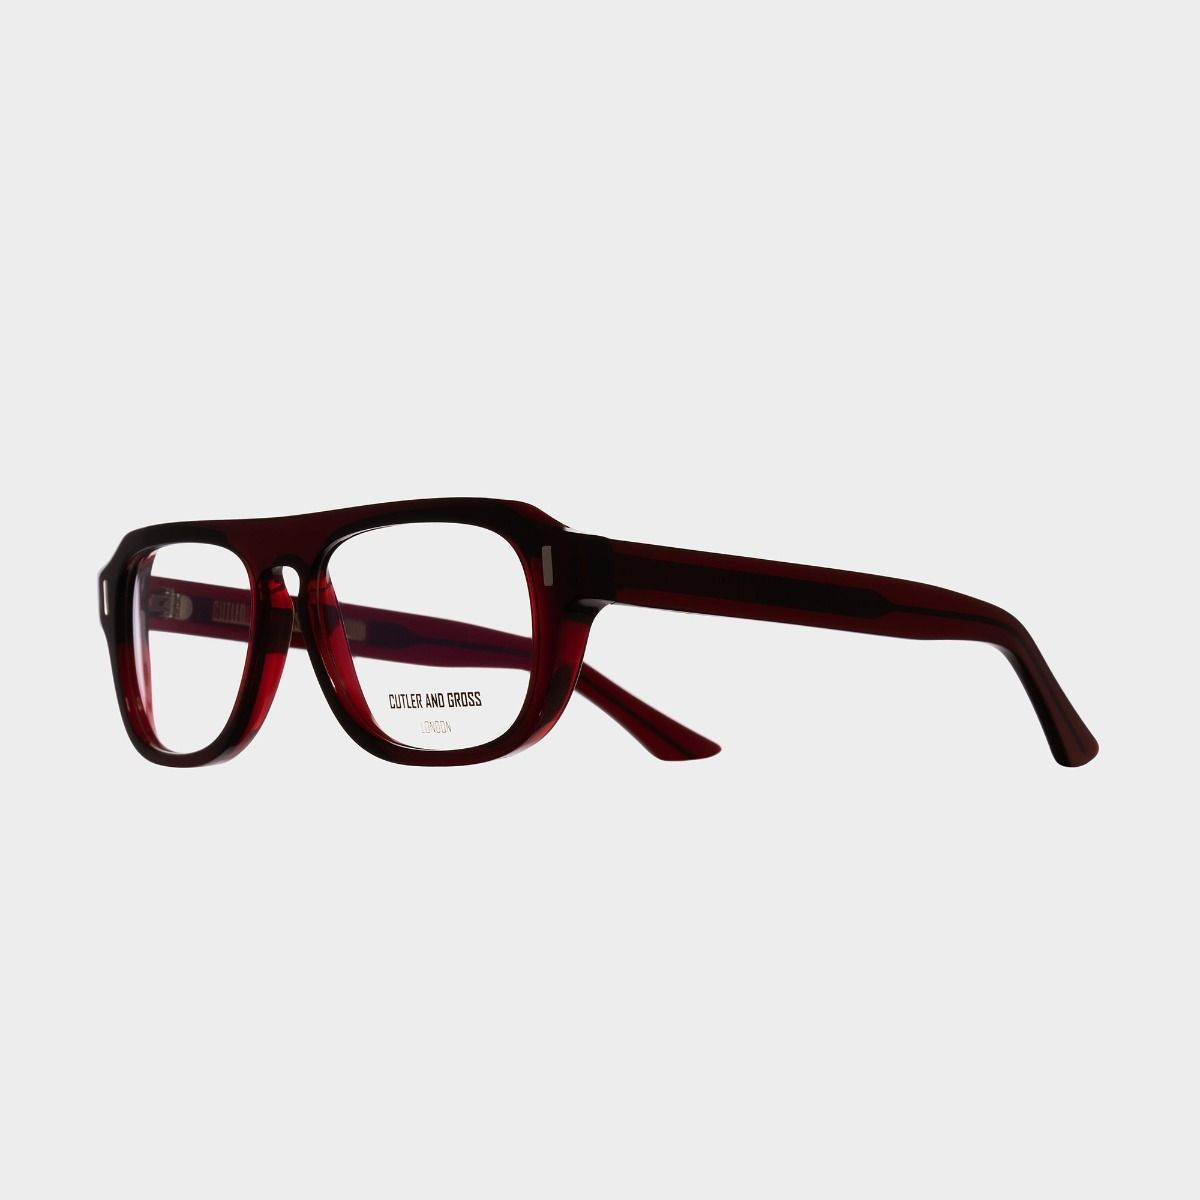 1319 Optical Aviator Glasses-Bordeaux Red